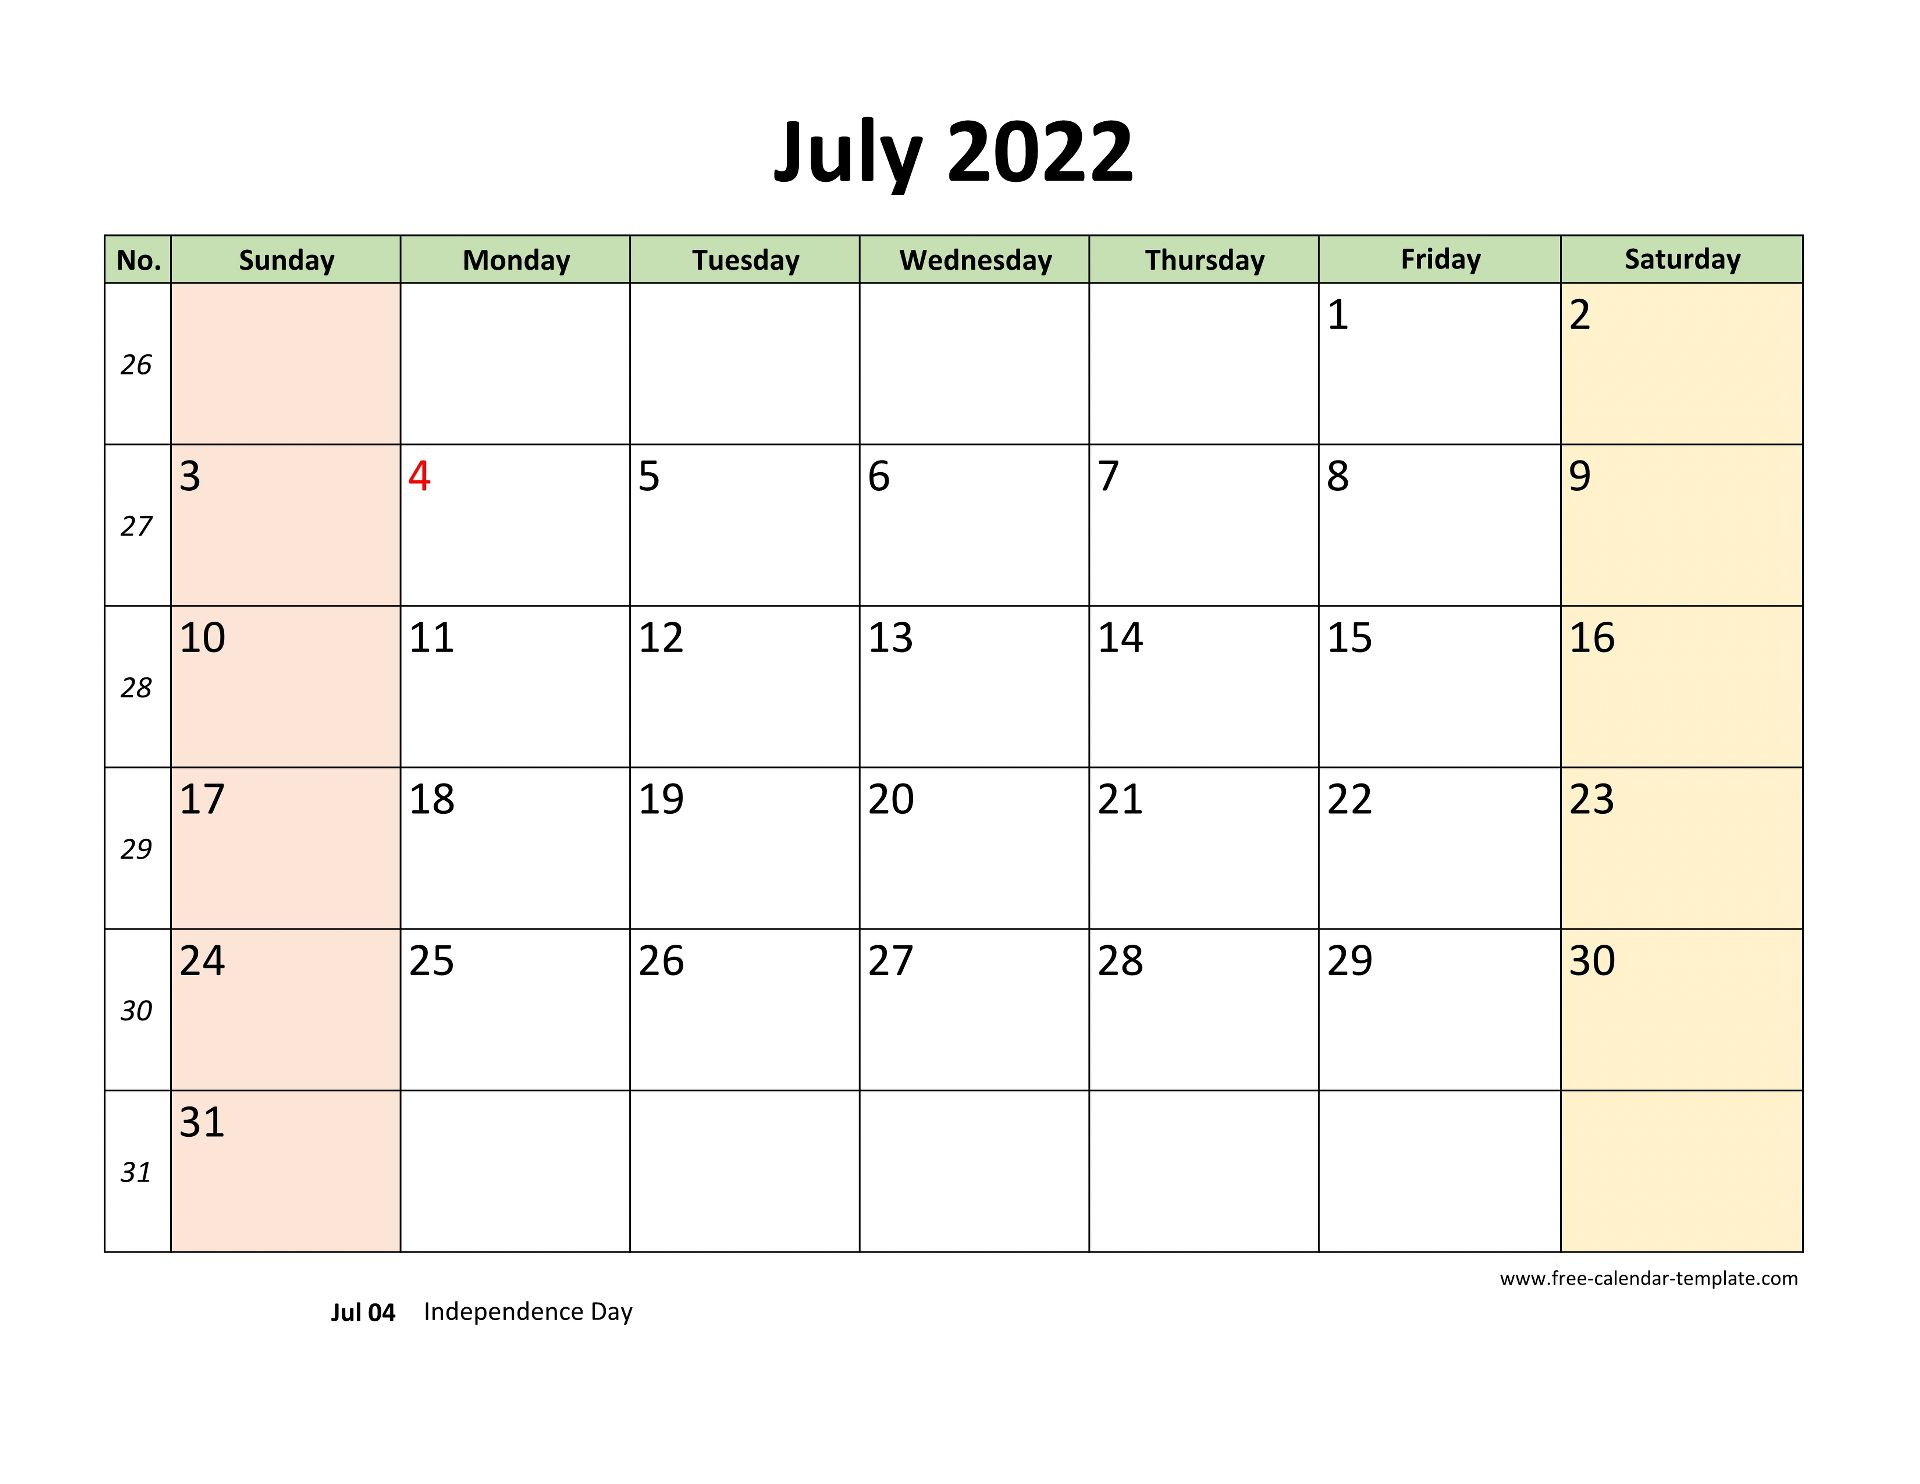 June July 2022 Calendar.July 2022 Calendar Printable With Coloring On Weekend Horizontal Free Calendar Template Com